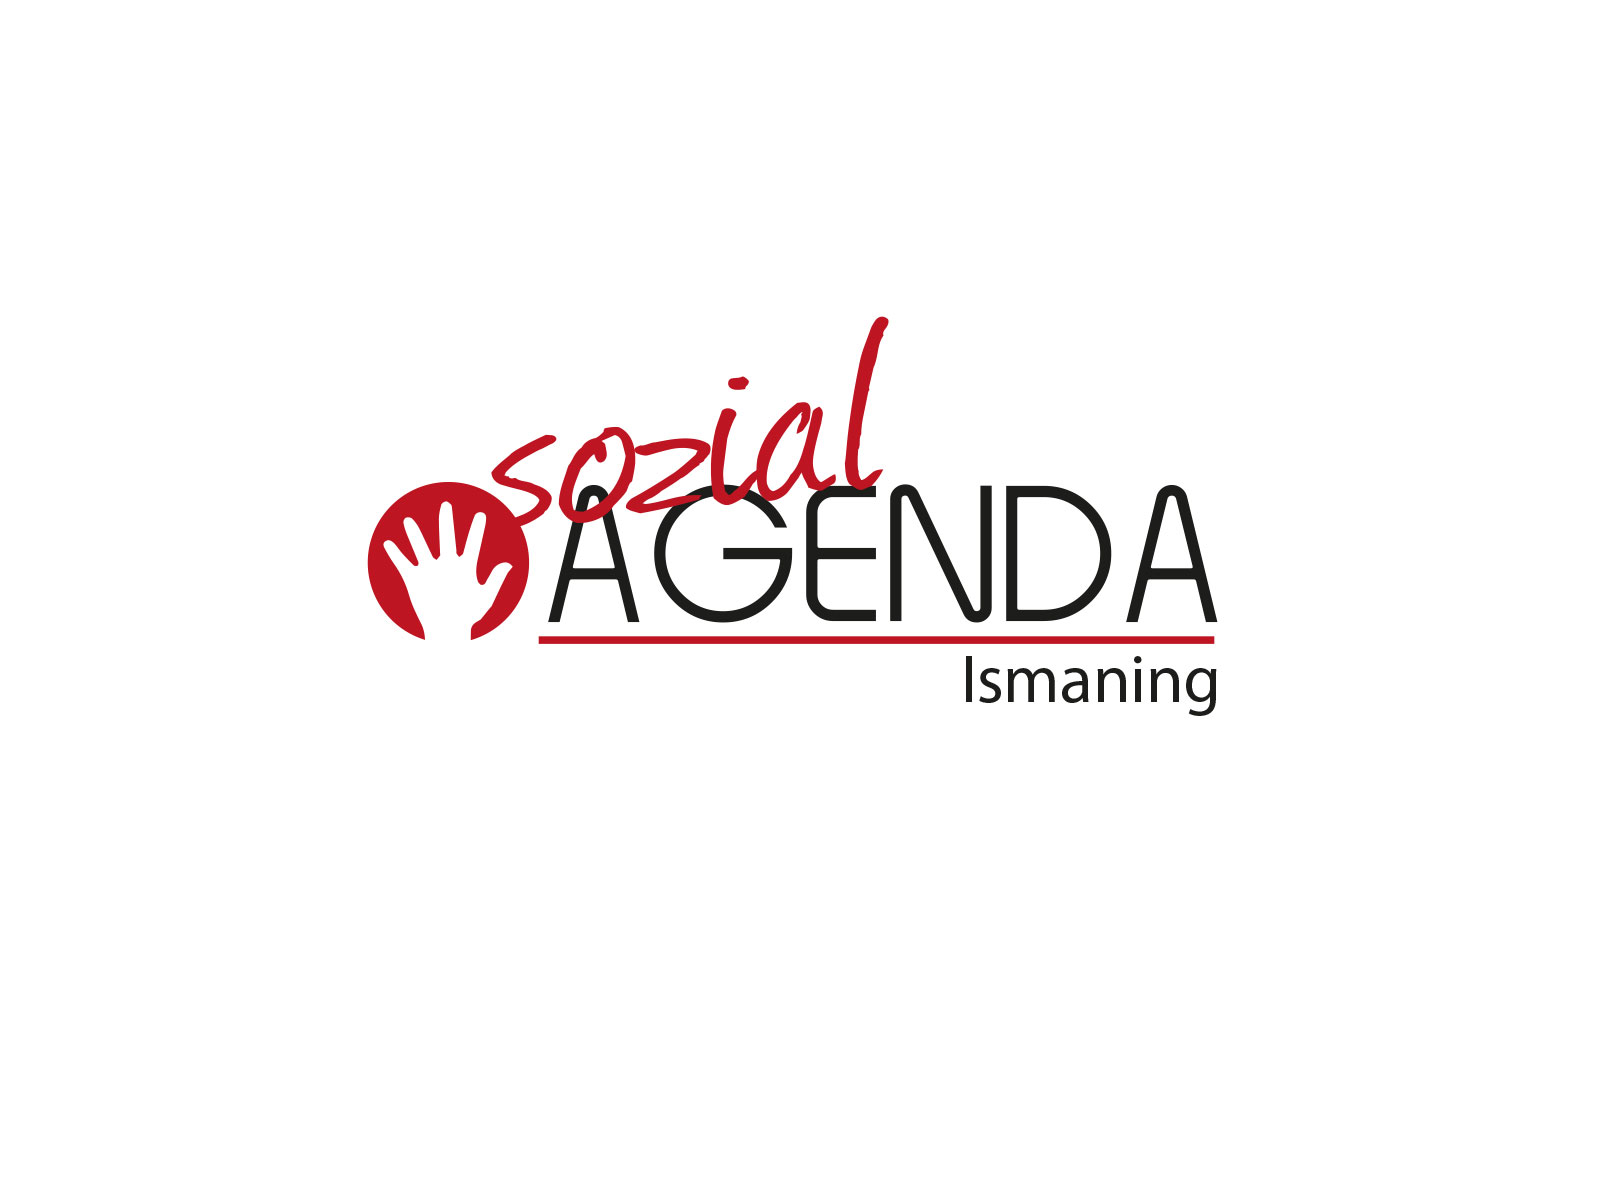 sozialagenda-logo